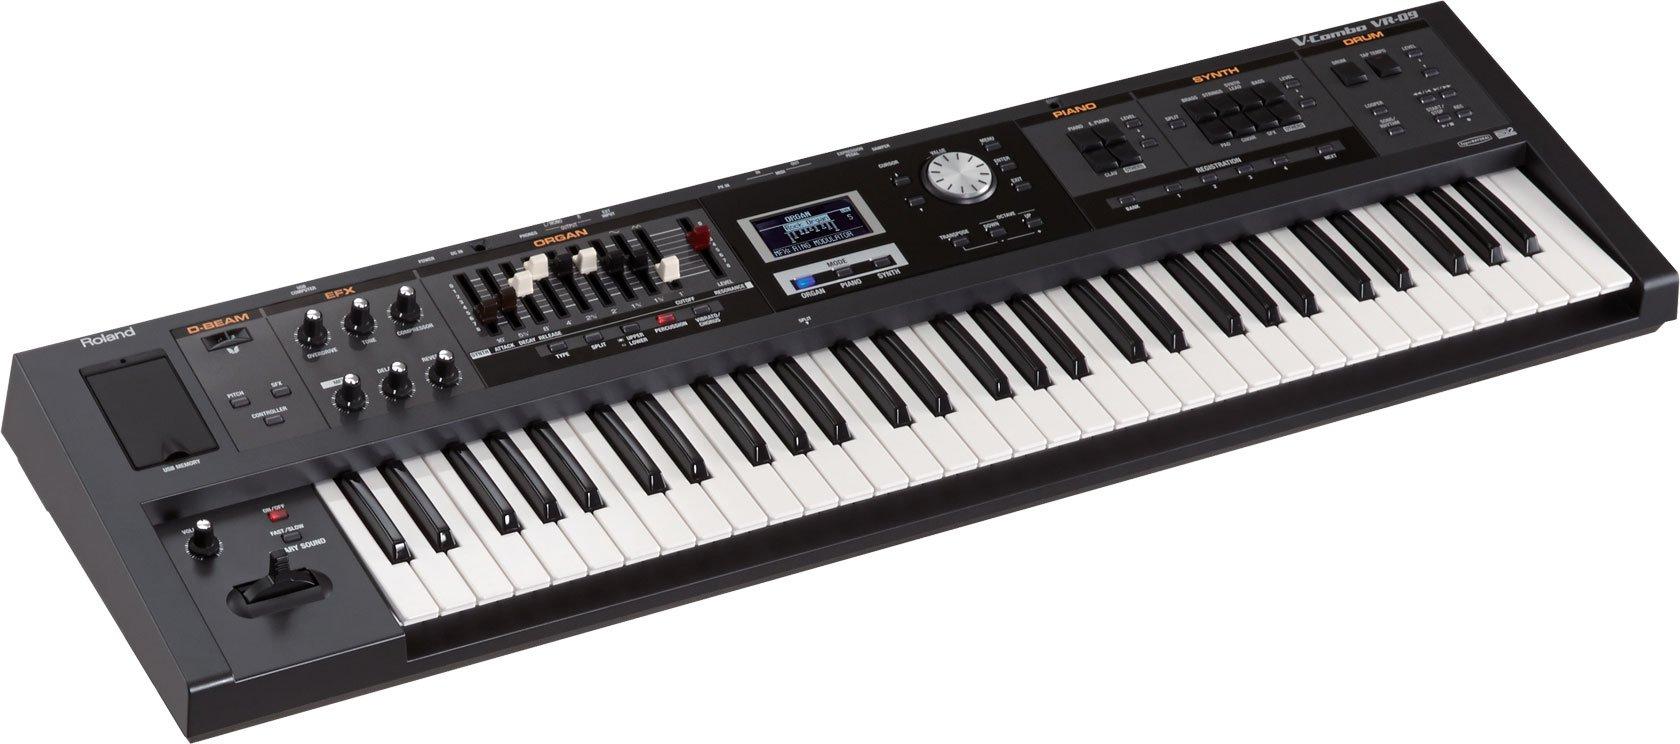 Roland V-Combo VR-09B 61-Key Live Performance Keyboard